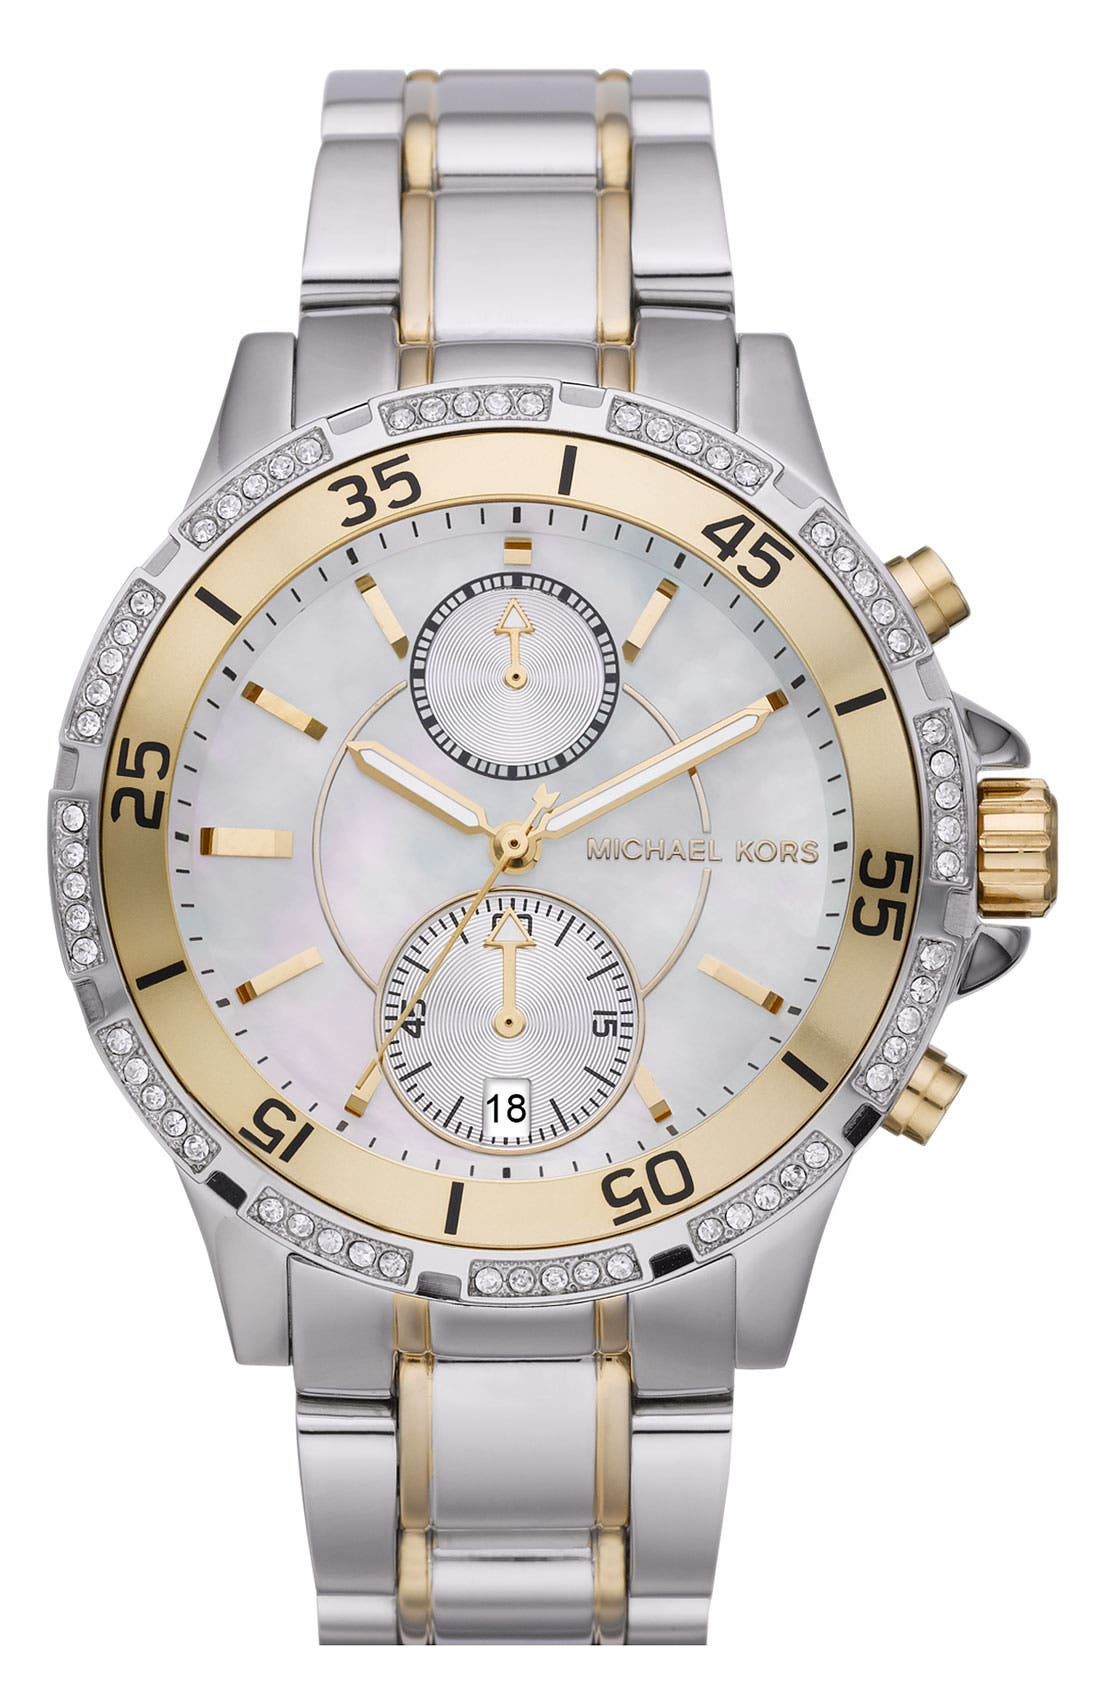 Main Image - Michael Kors 'Garret' Chronograph & Crystal Watch